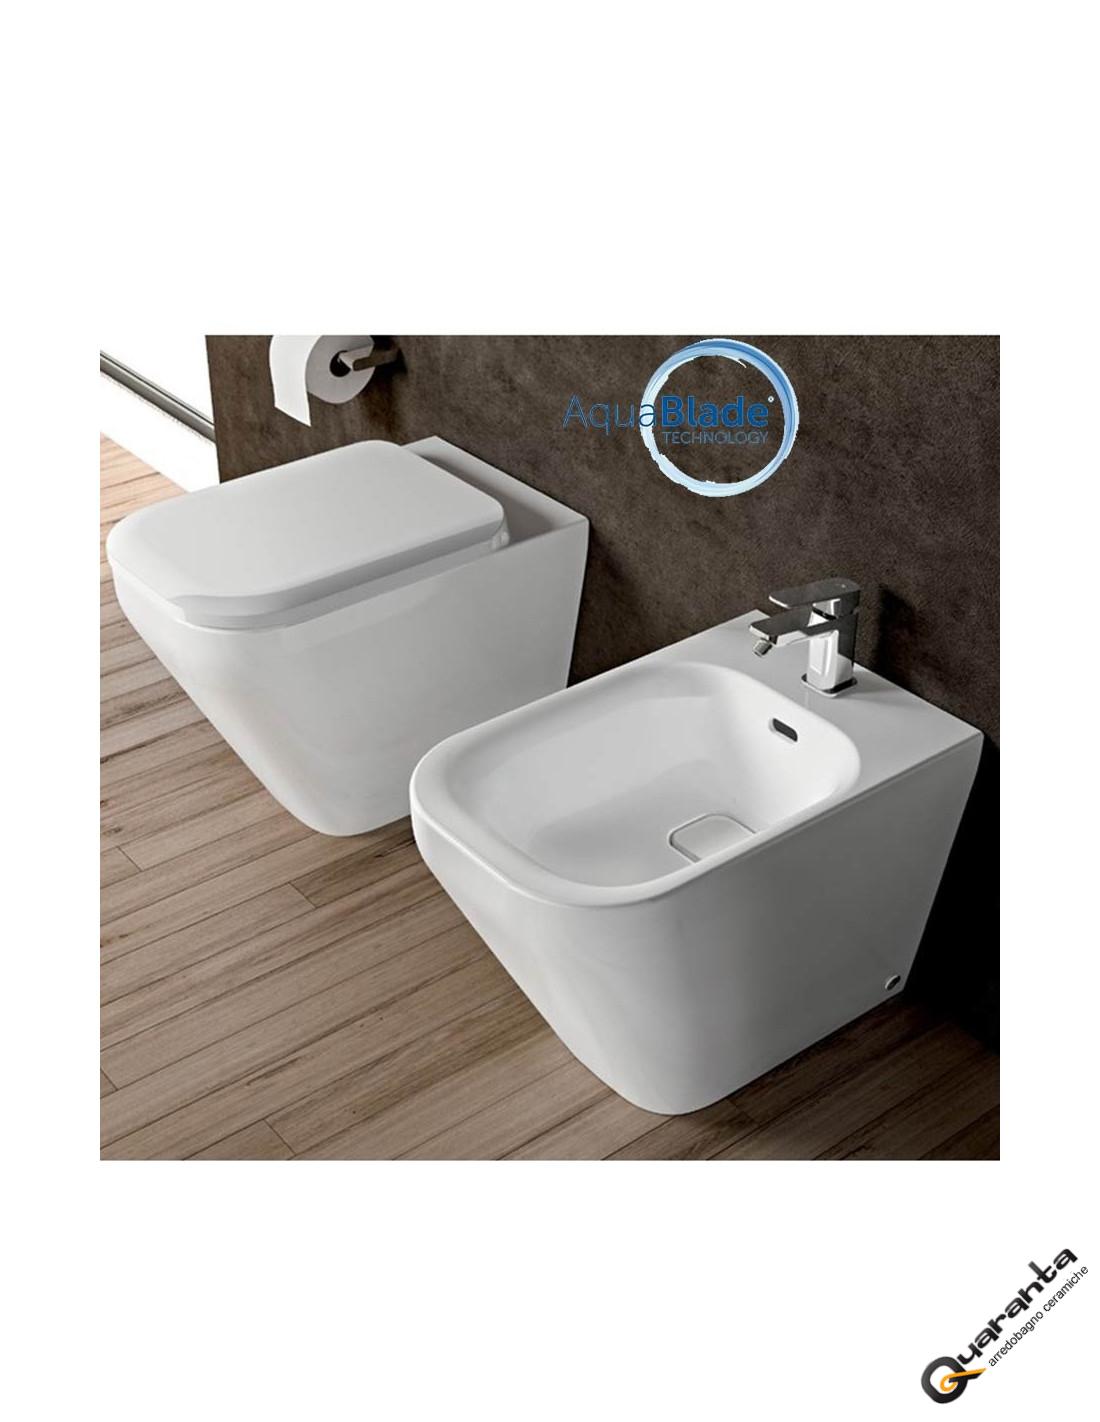 sanitari quaranta ceramiche vaso bidet coprivaso aquablade